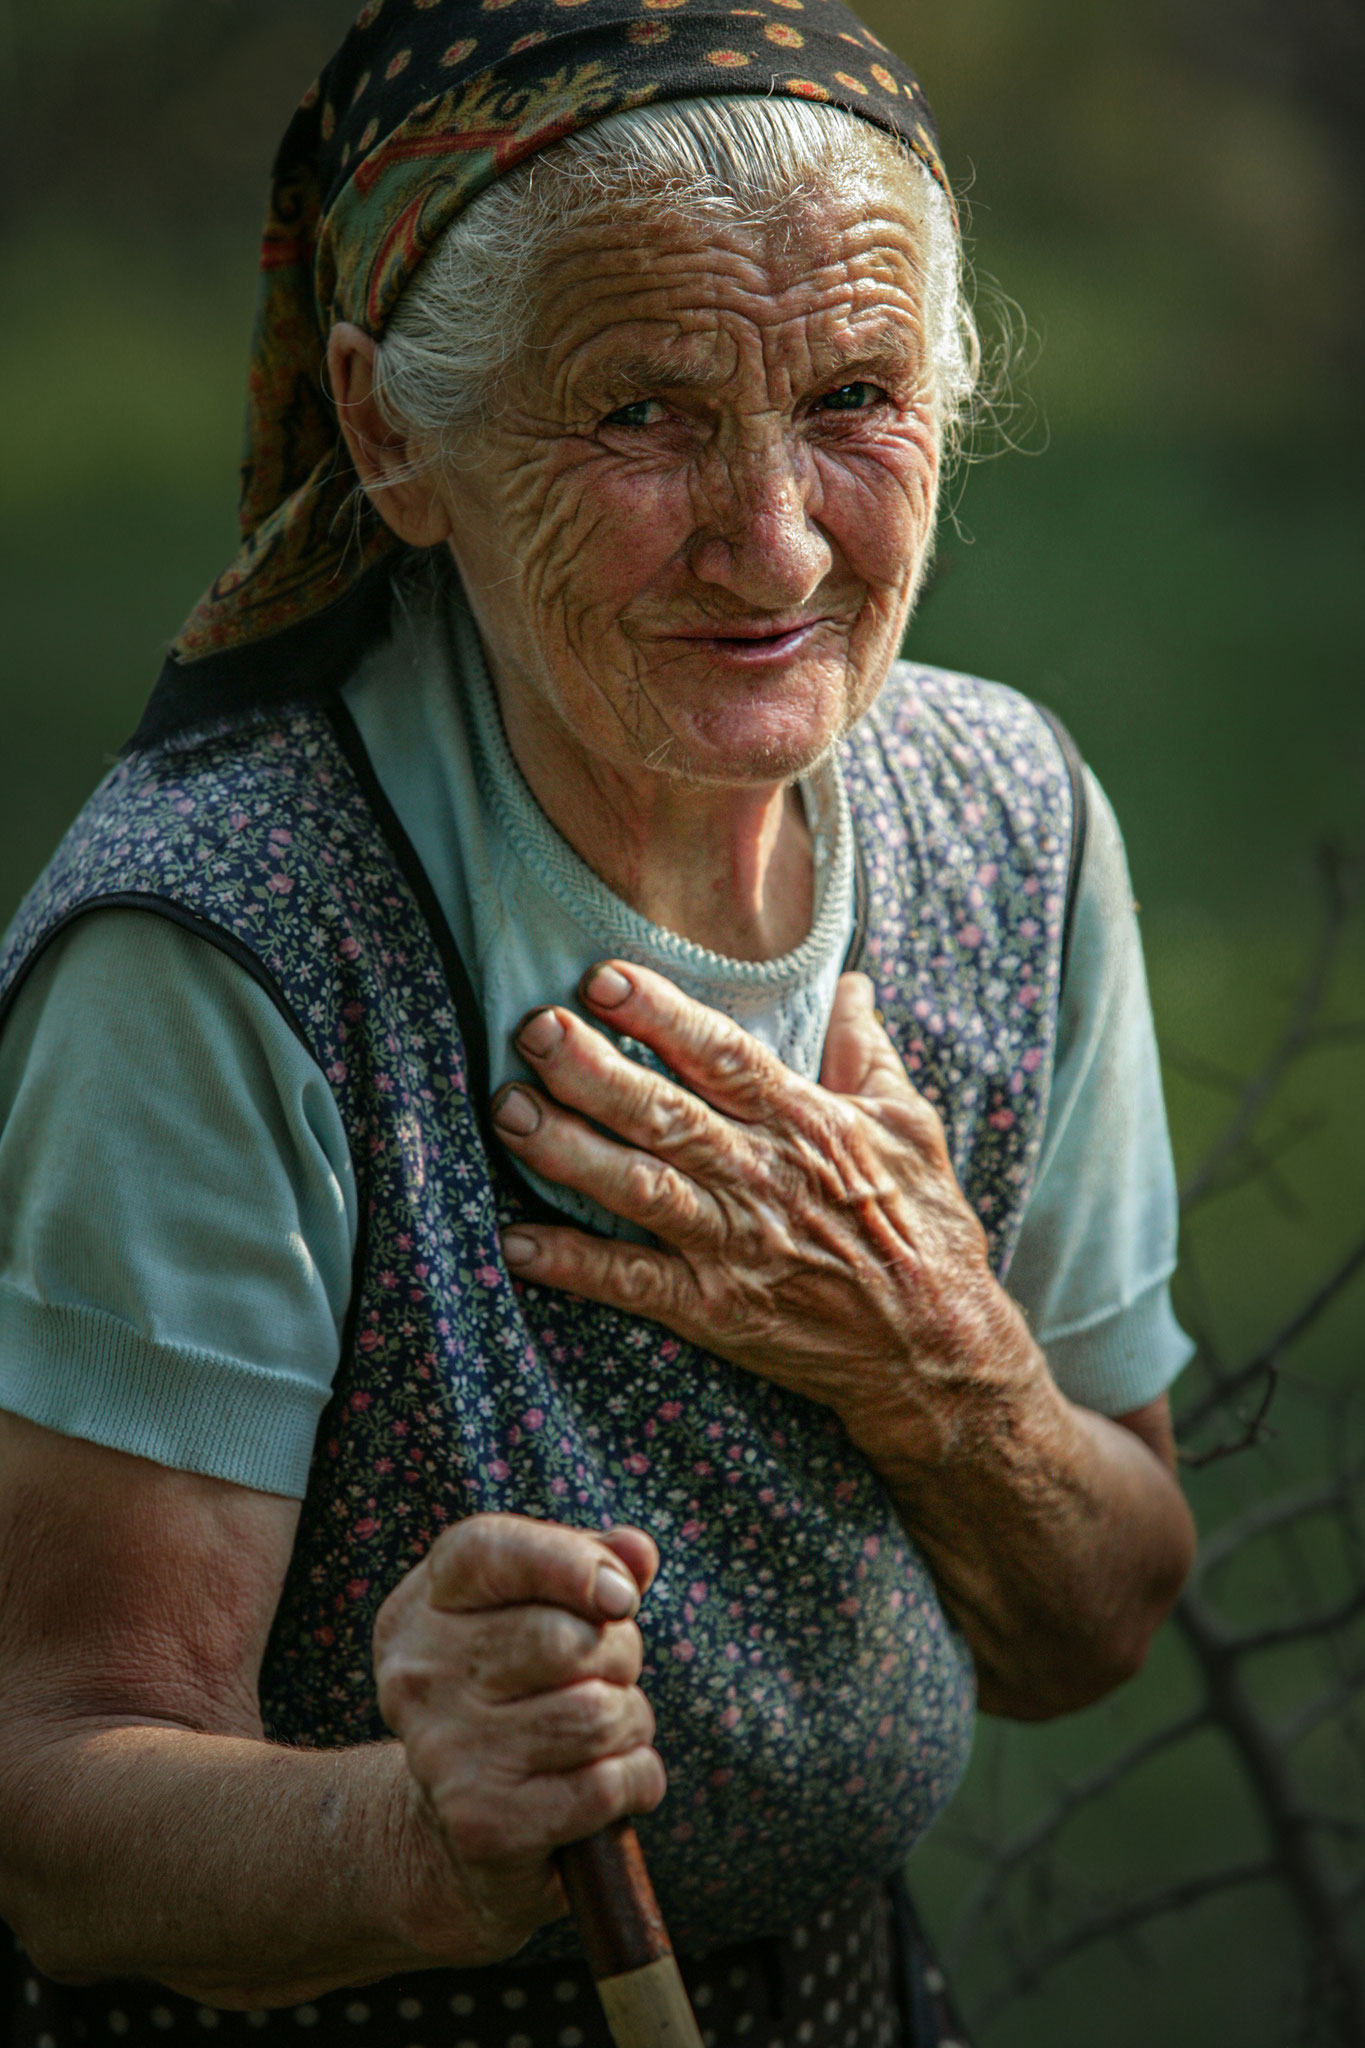 Volodimir Norba AFIAP (Ukraine) - Vilshynky grandma